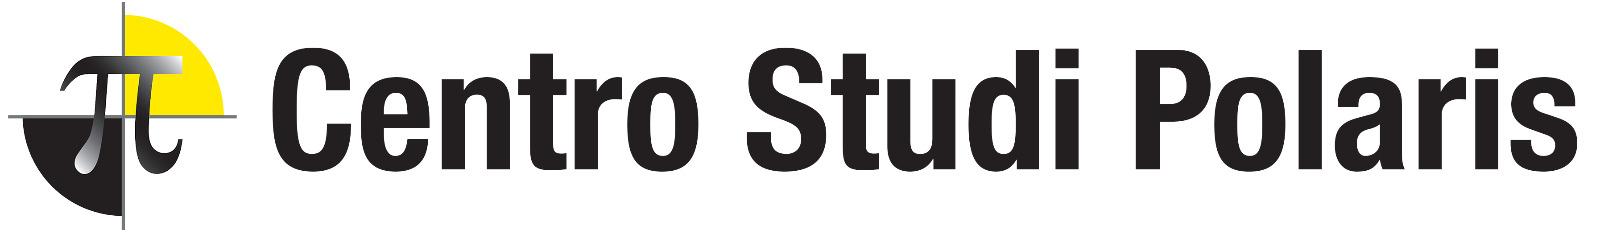 Centro Studi Polaris